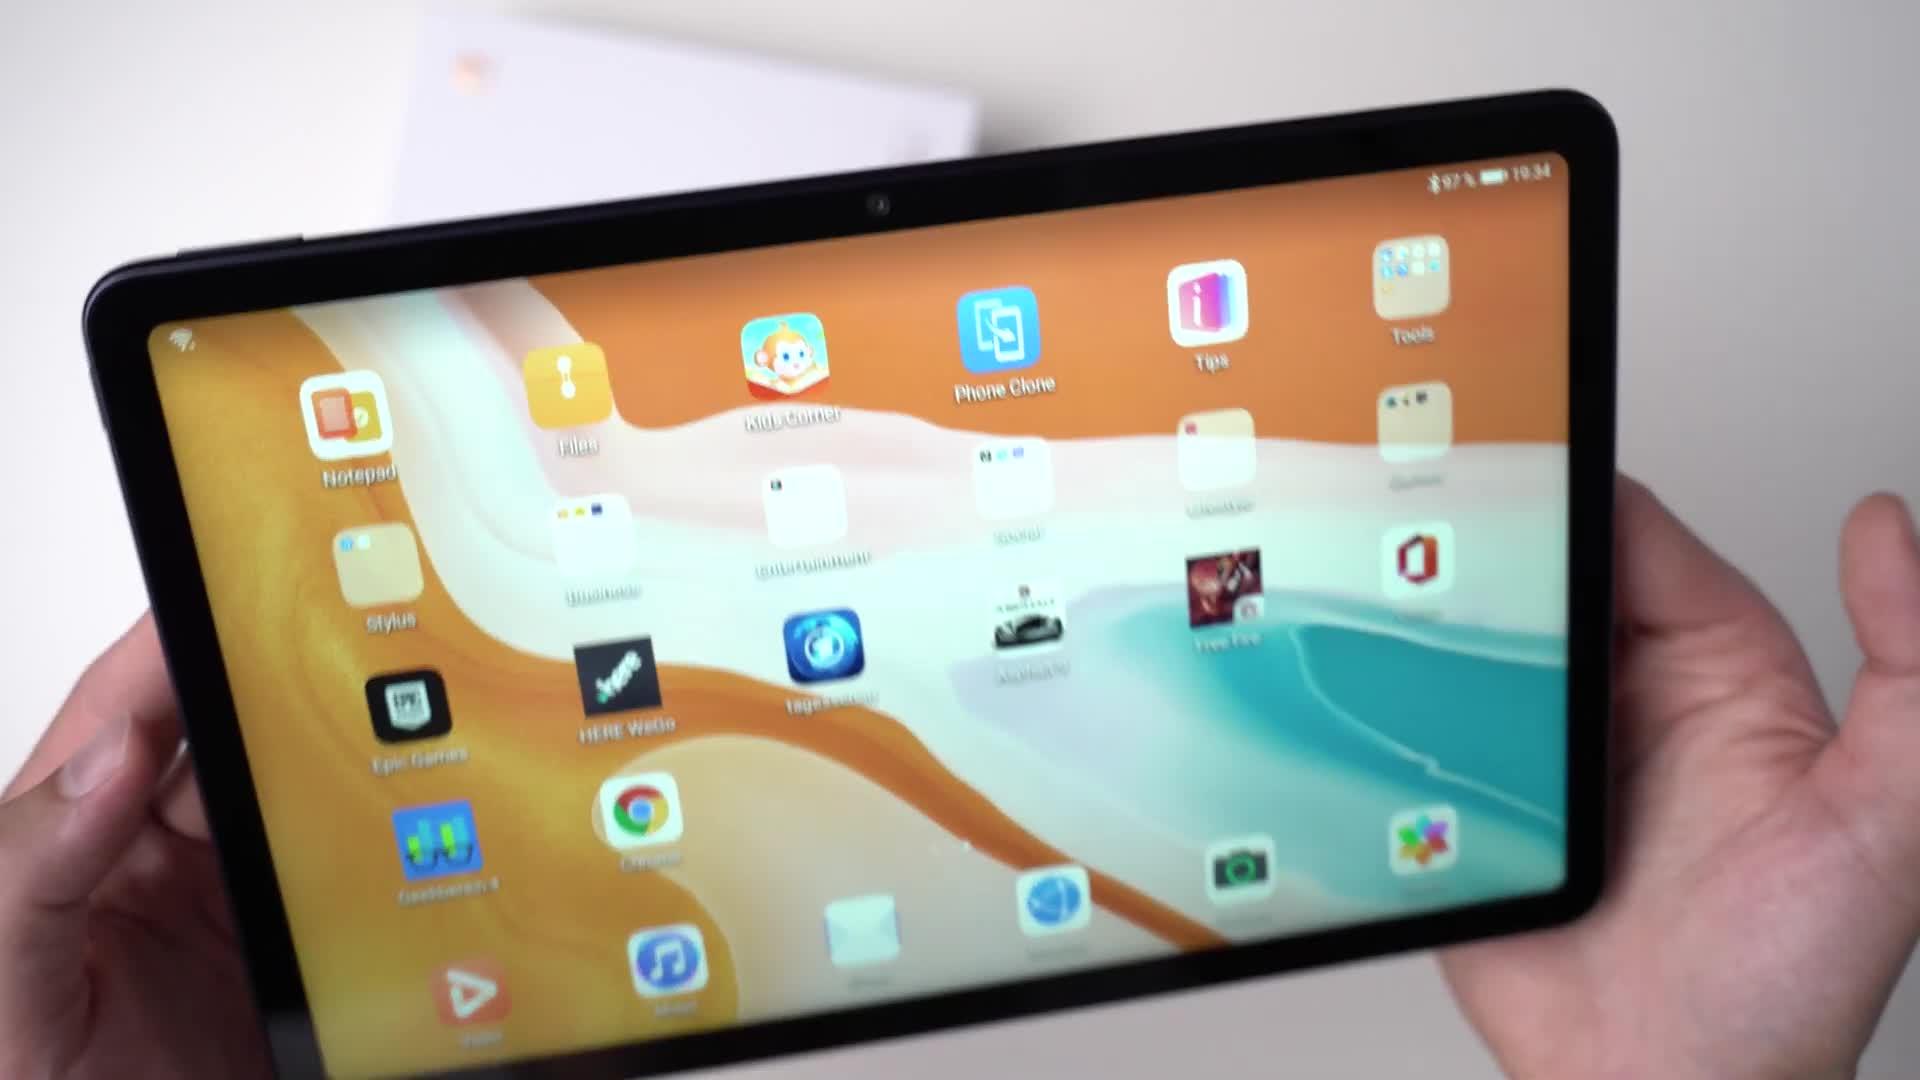 Android, Tablet, Hands-On, Andrzej Tokarski, Tabletblog, Unboxing, MatePad, Huawei MatePad, Huawei MatePad 10.4, MatePad 10.4